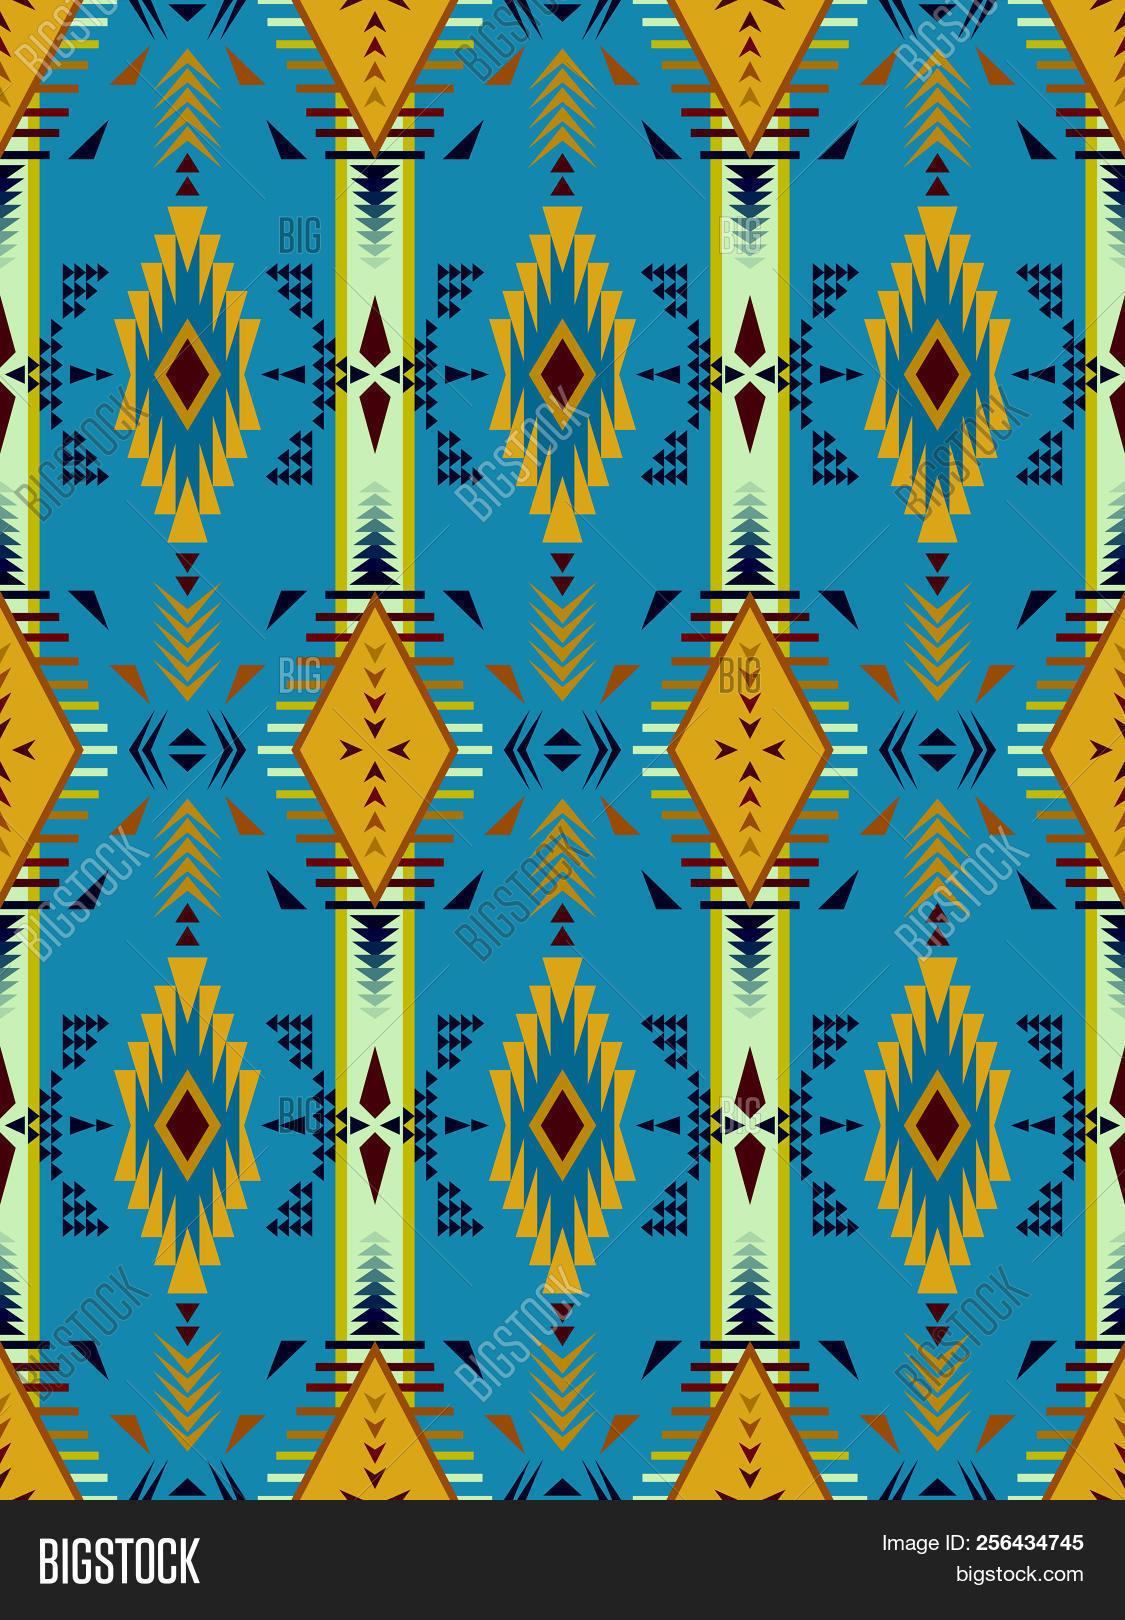 Aztec Geometric Vector Photo Free Trial Bigstock